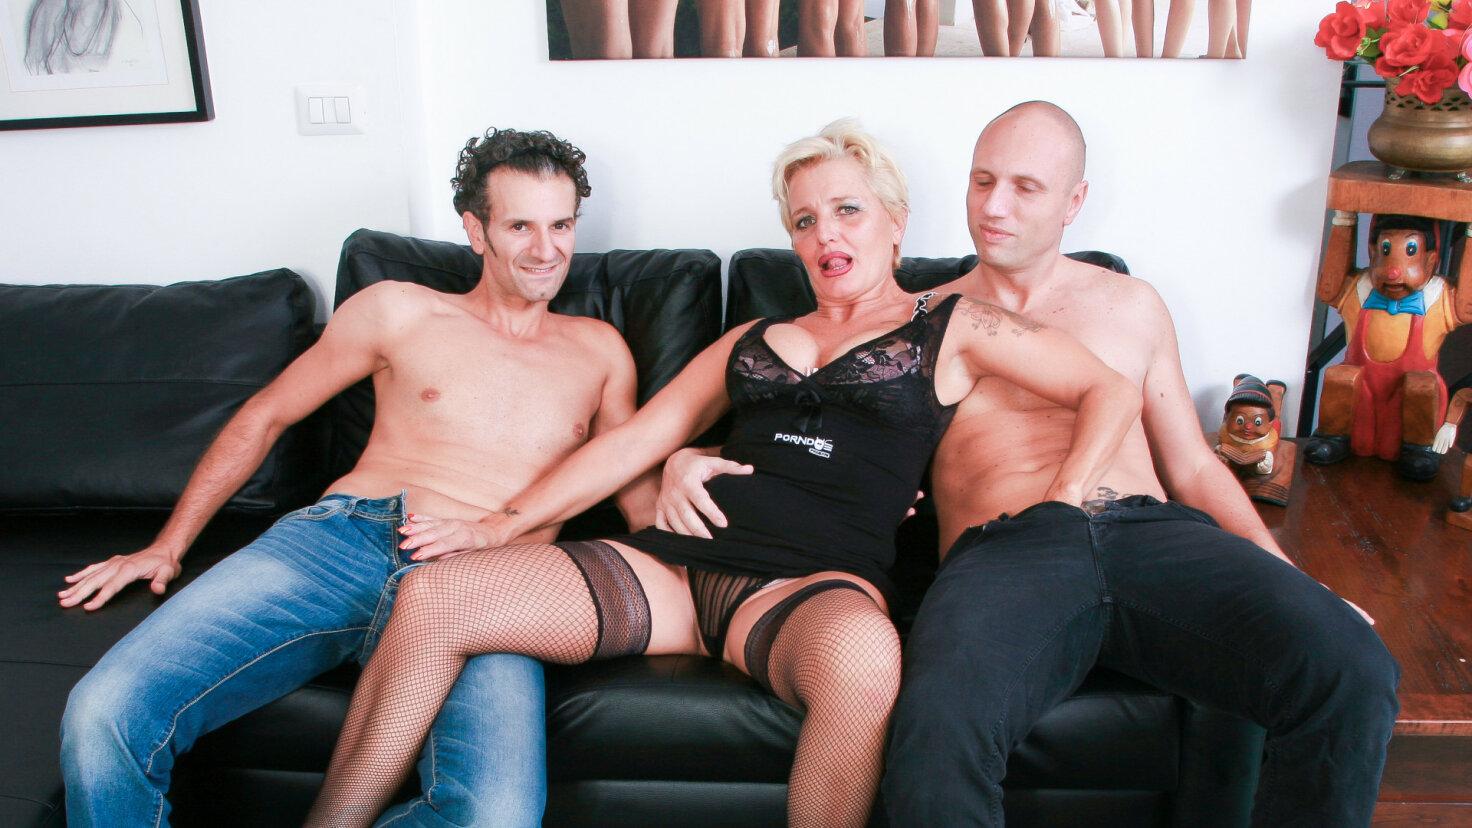 Wild mature Italian swinger gets DP in hardcore FFM threesome